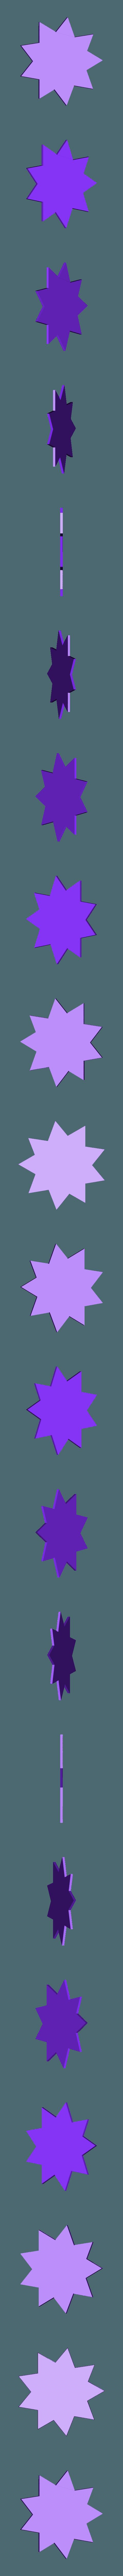 étoiles3.stl Download STL file snow stars • Model to 3D print, catf3d